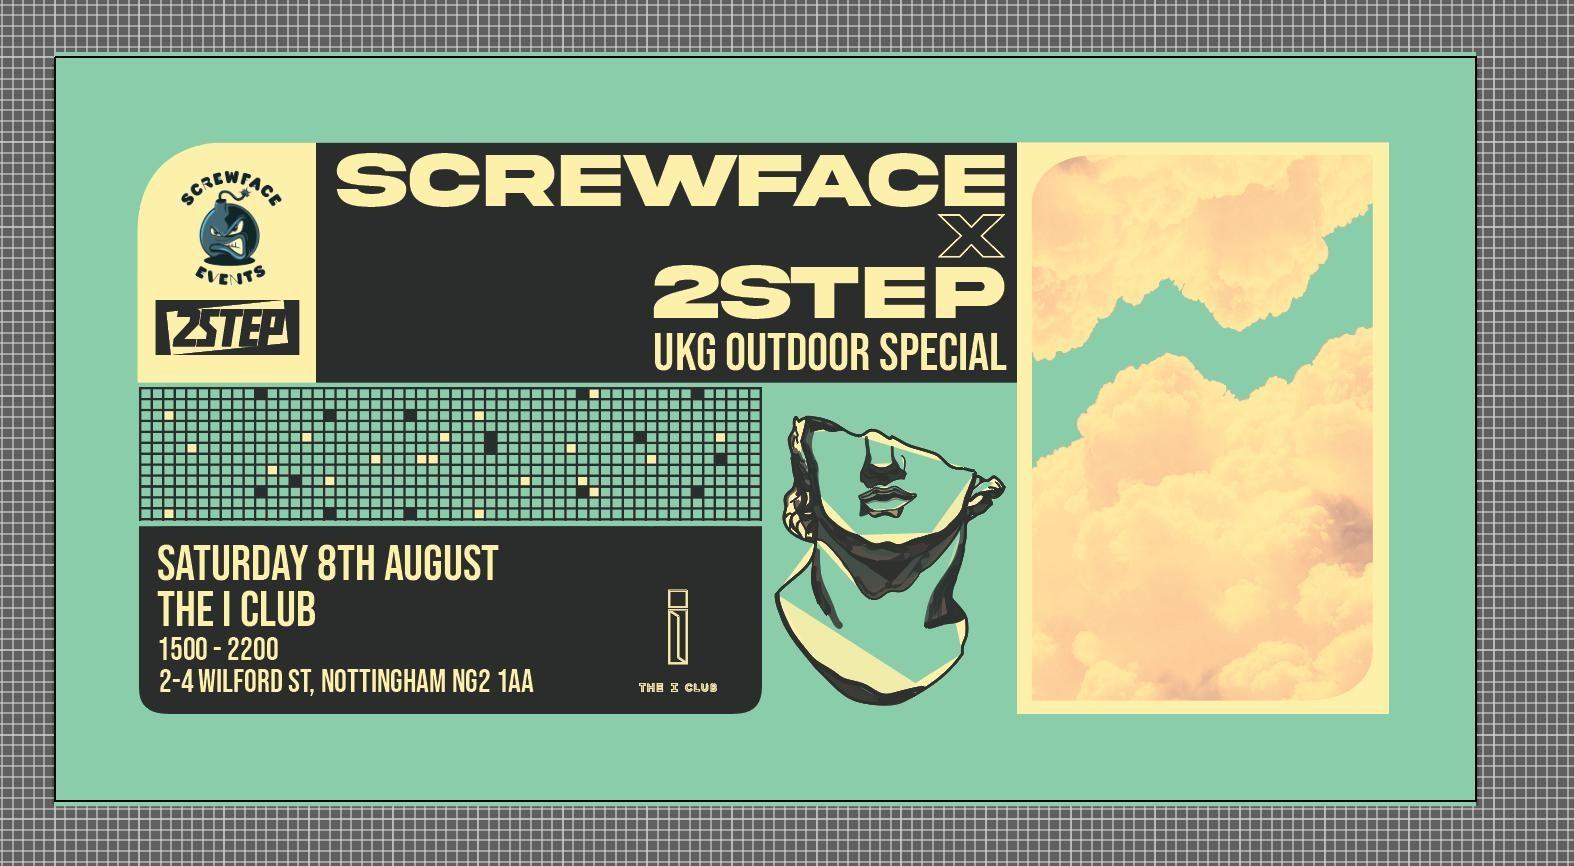 2step x Screwface